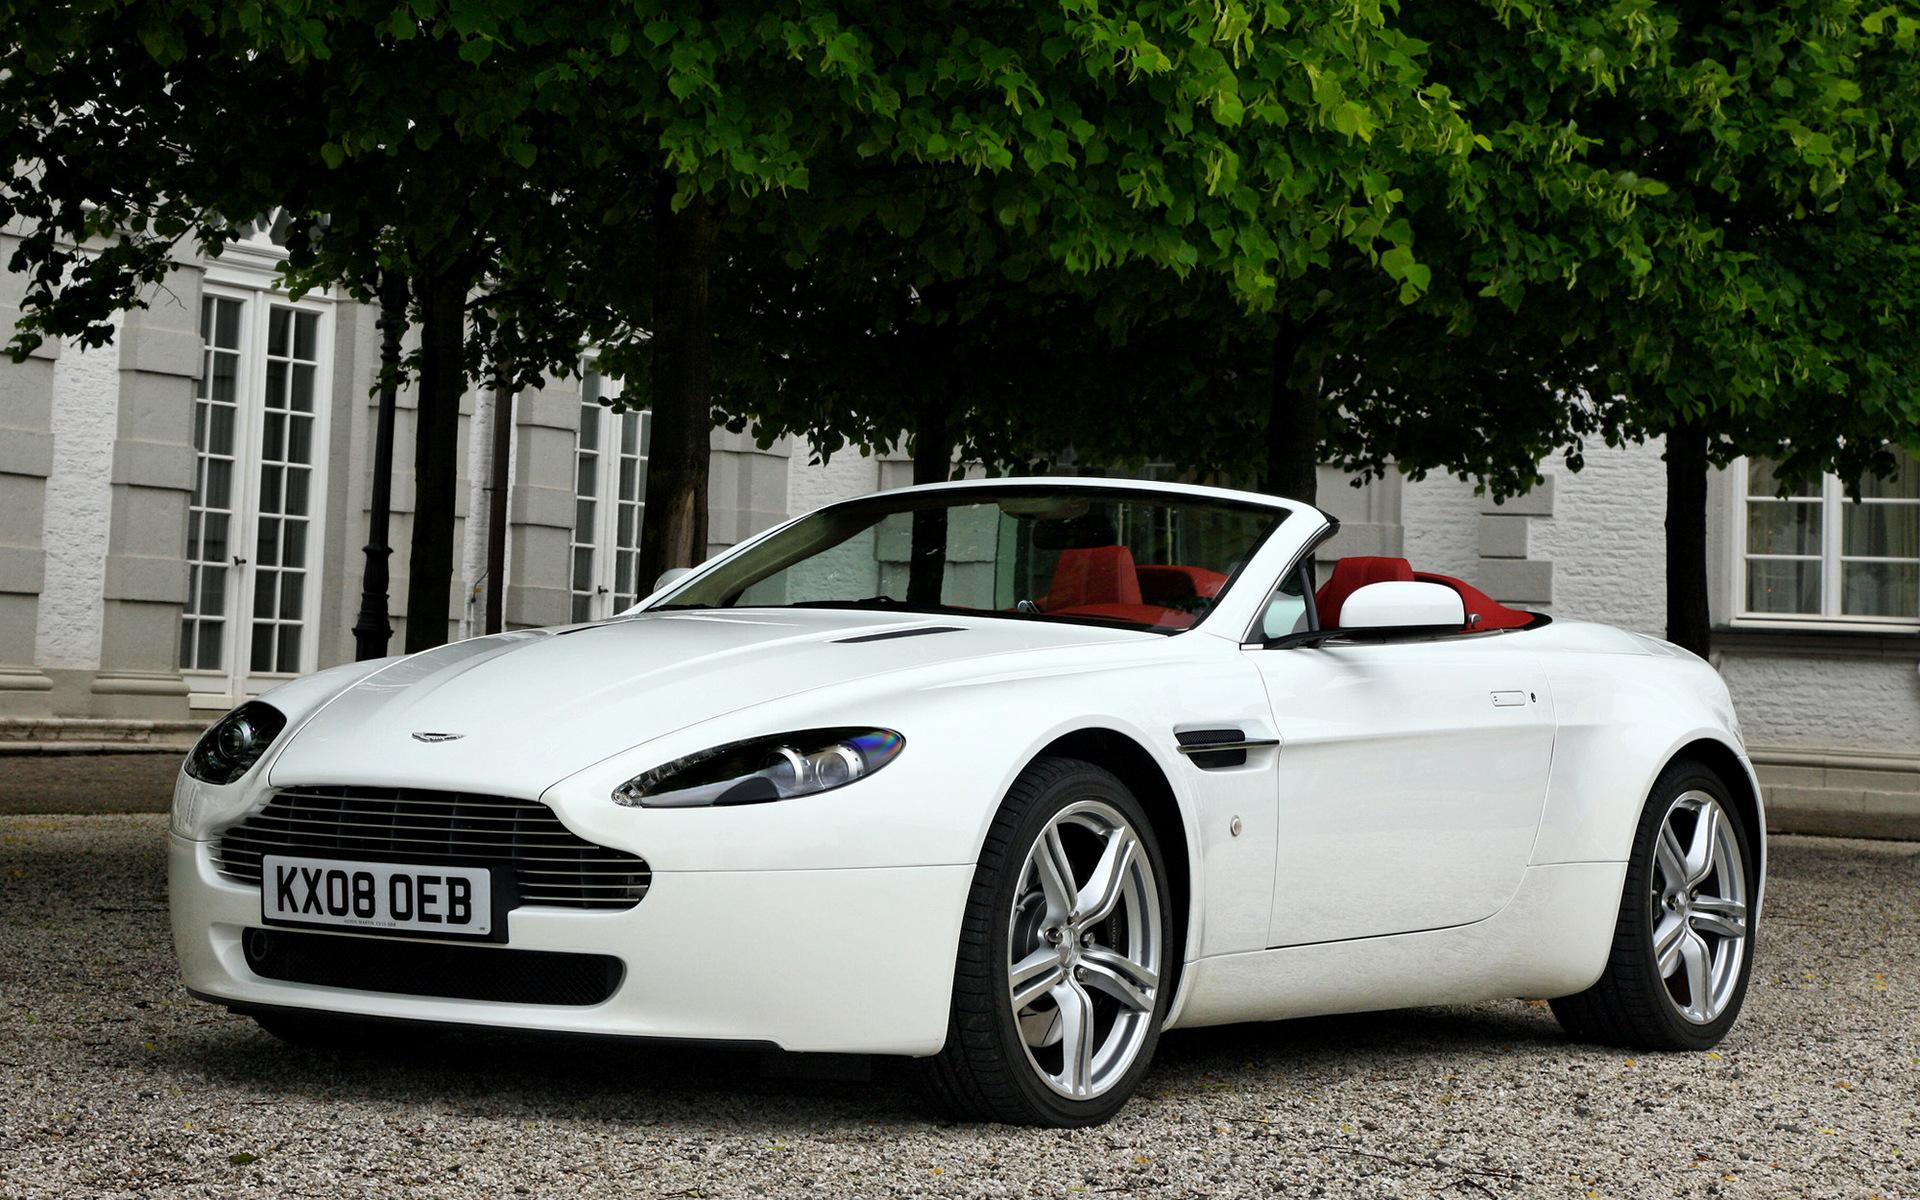 2008 Aston Martin V8 Vantage Roadster Hintergrundbilder Und Wallpaper In Hd Car Pixel